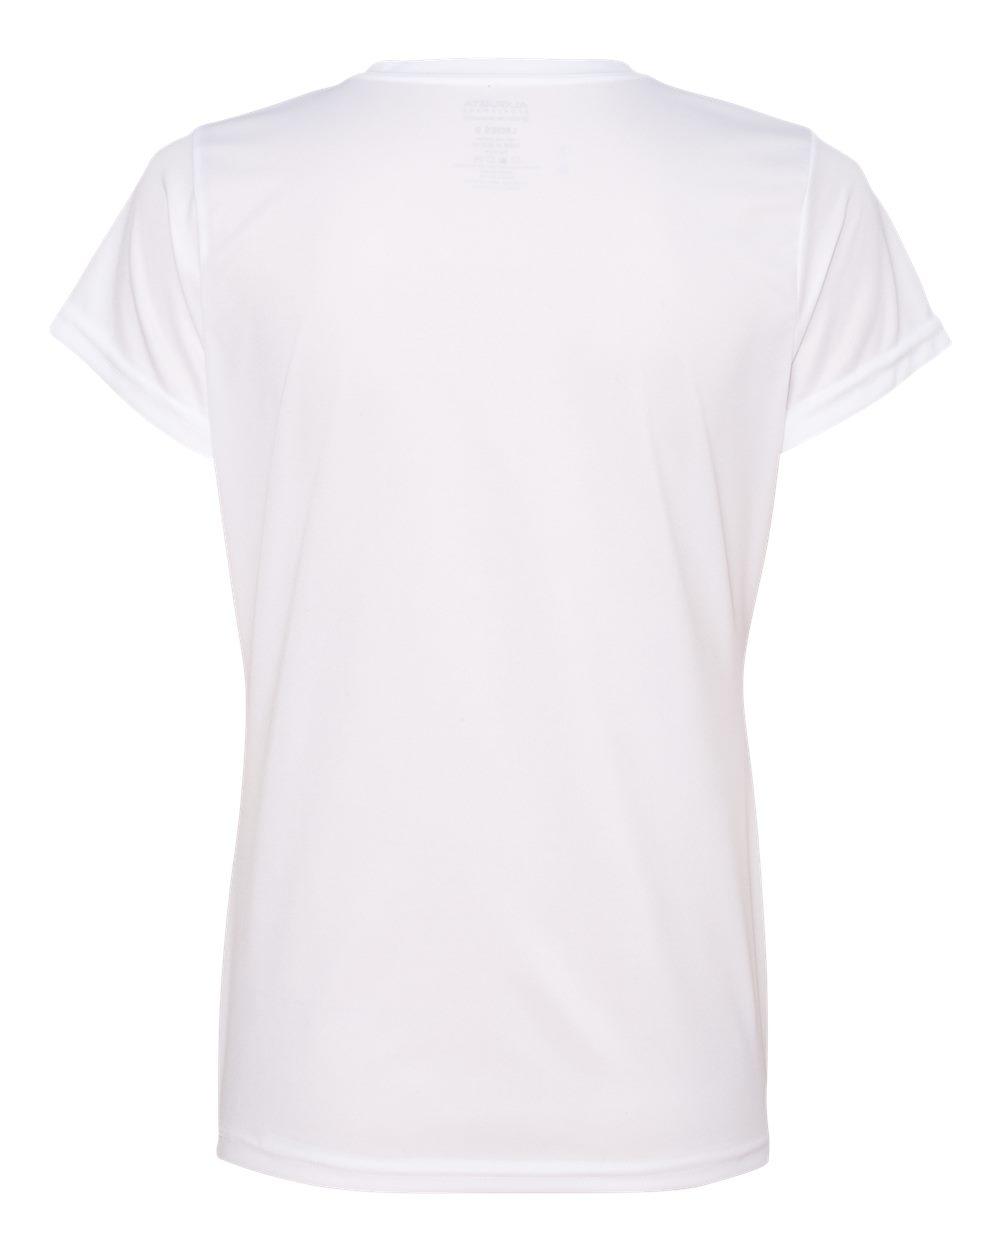 Augusta-Sportswear-Women-039-s-Moisture-Wicking-V-Neck-T-Shirt-1790-XS-2XL thumbnail 34